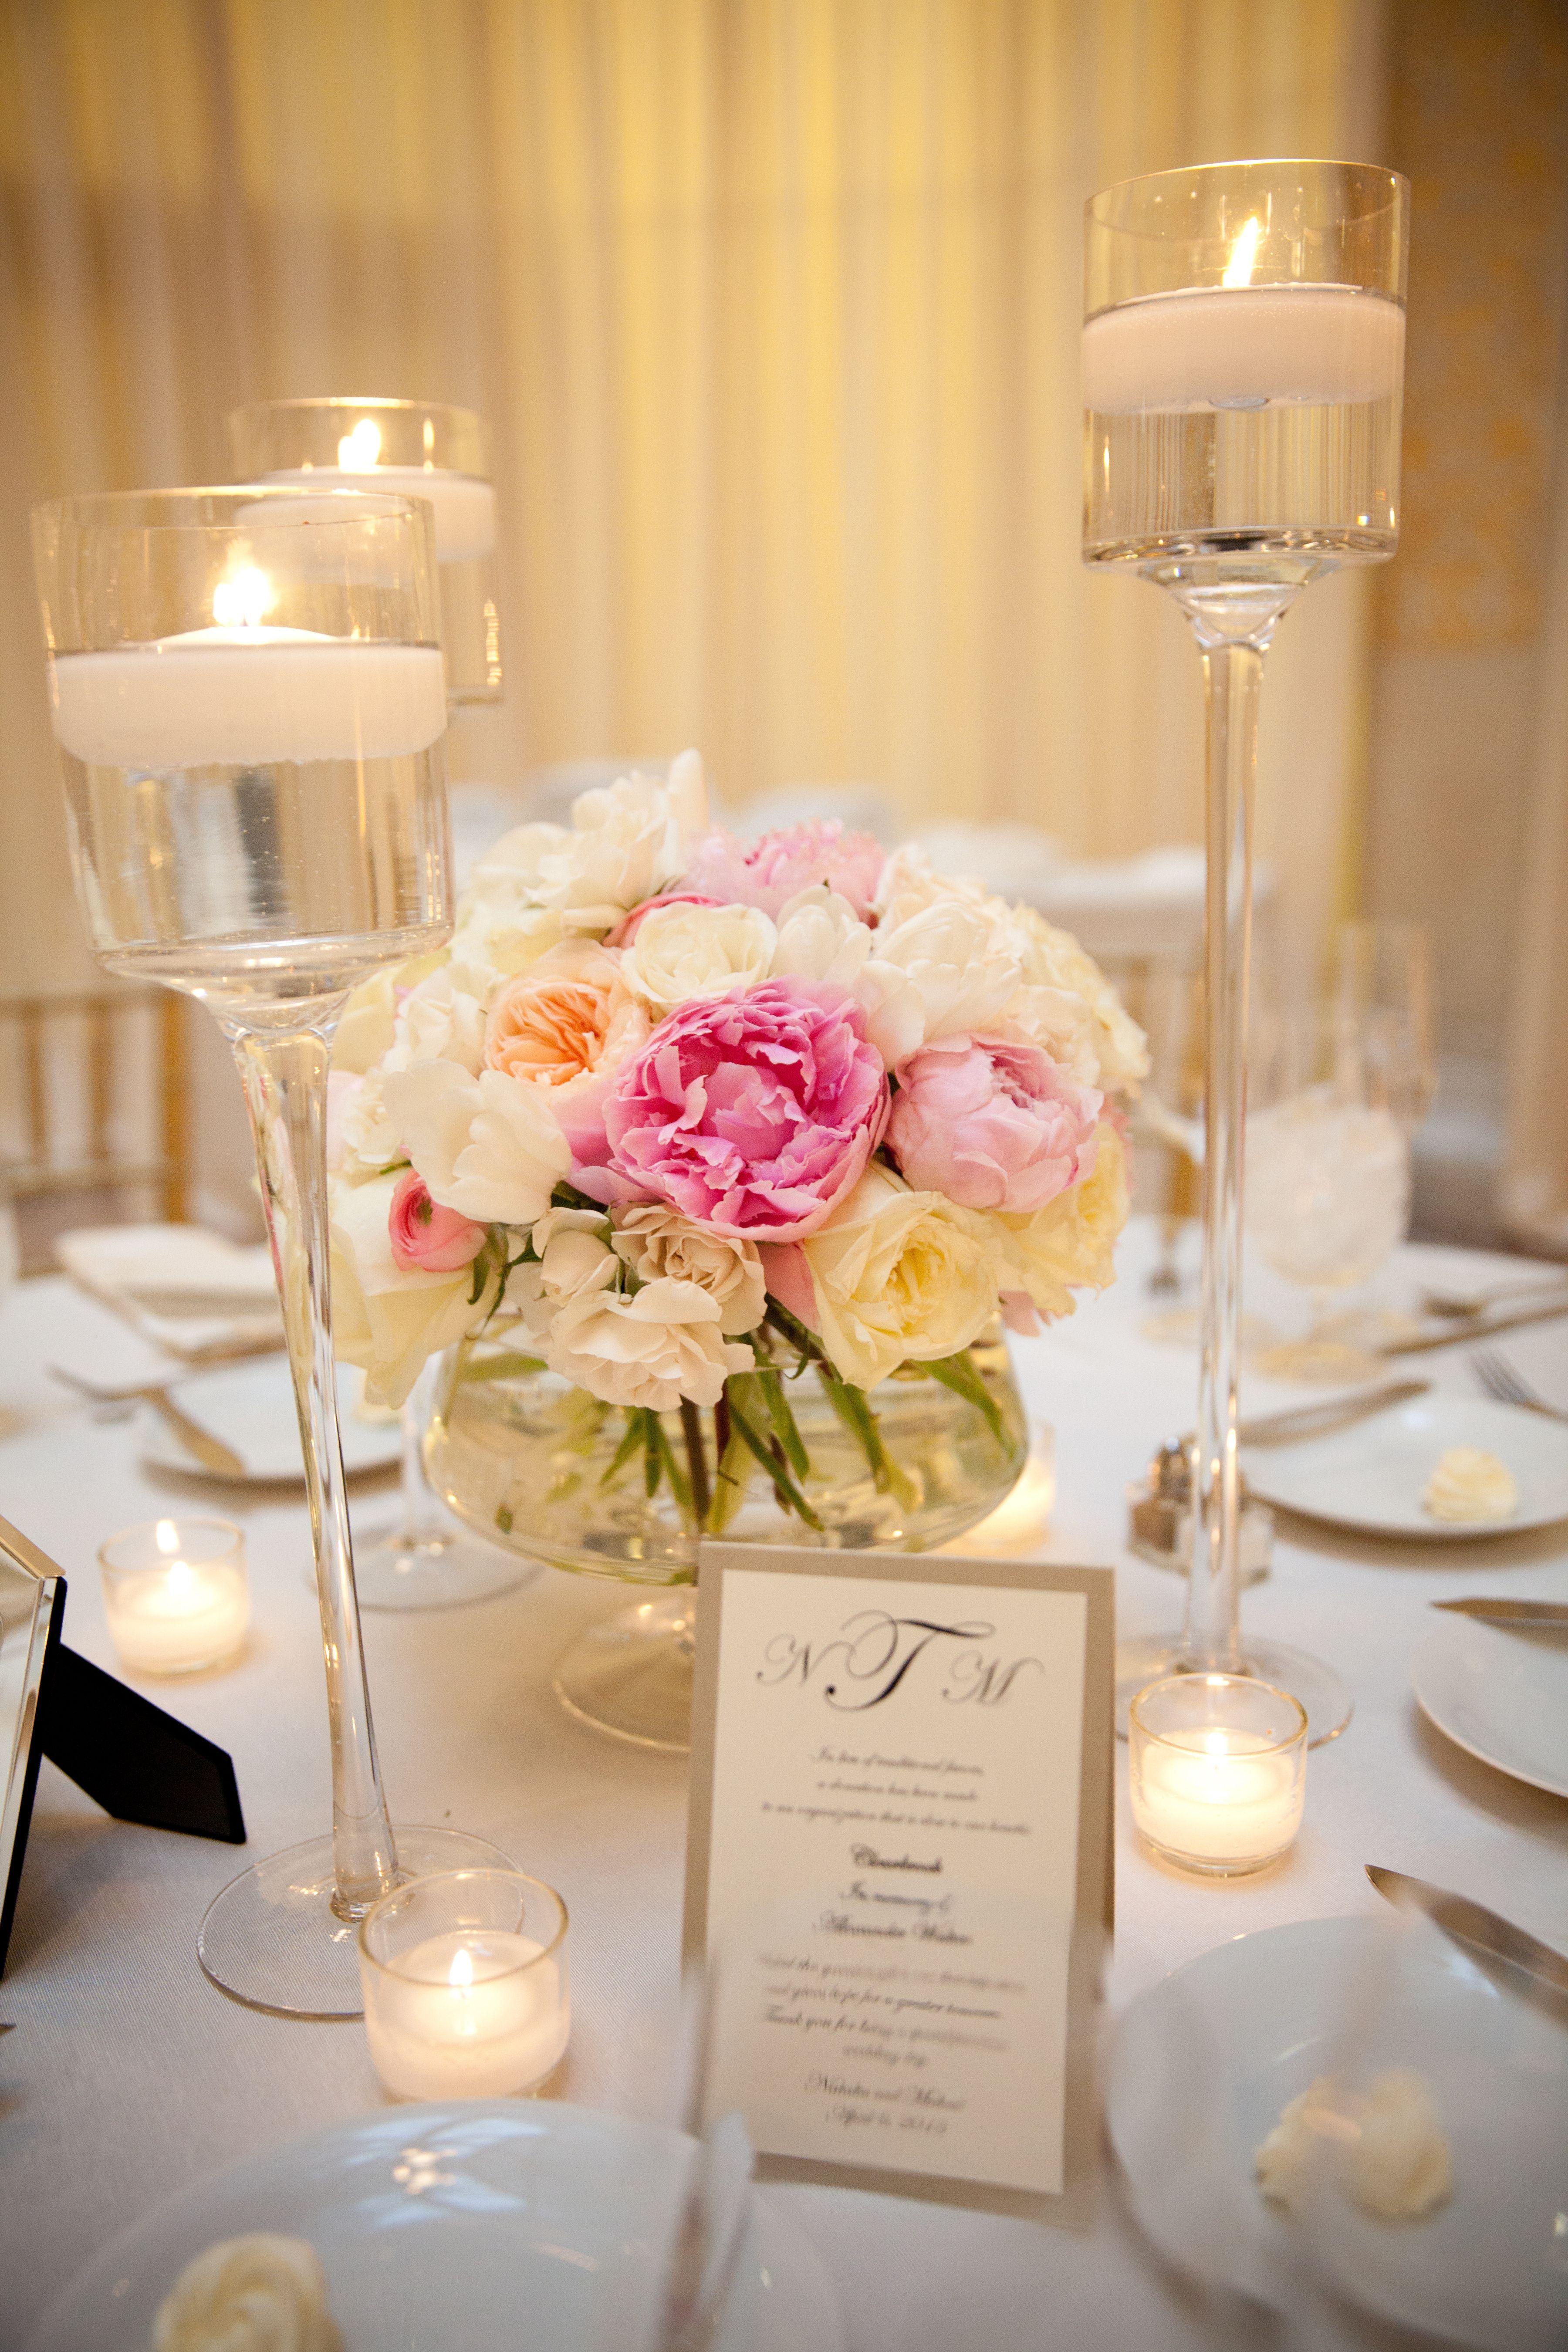 Flowers u decor real weddings wedding style pink centerpieces